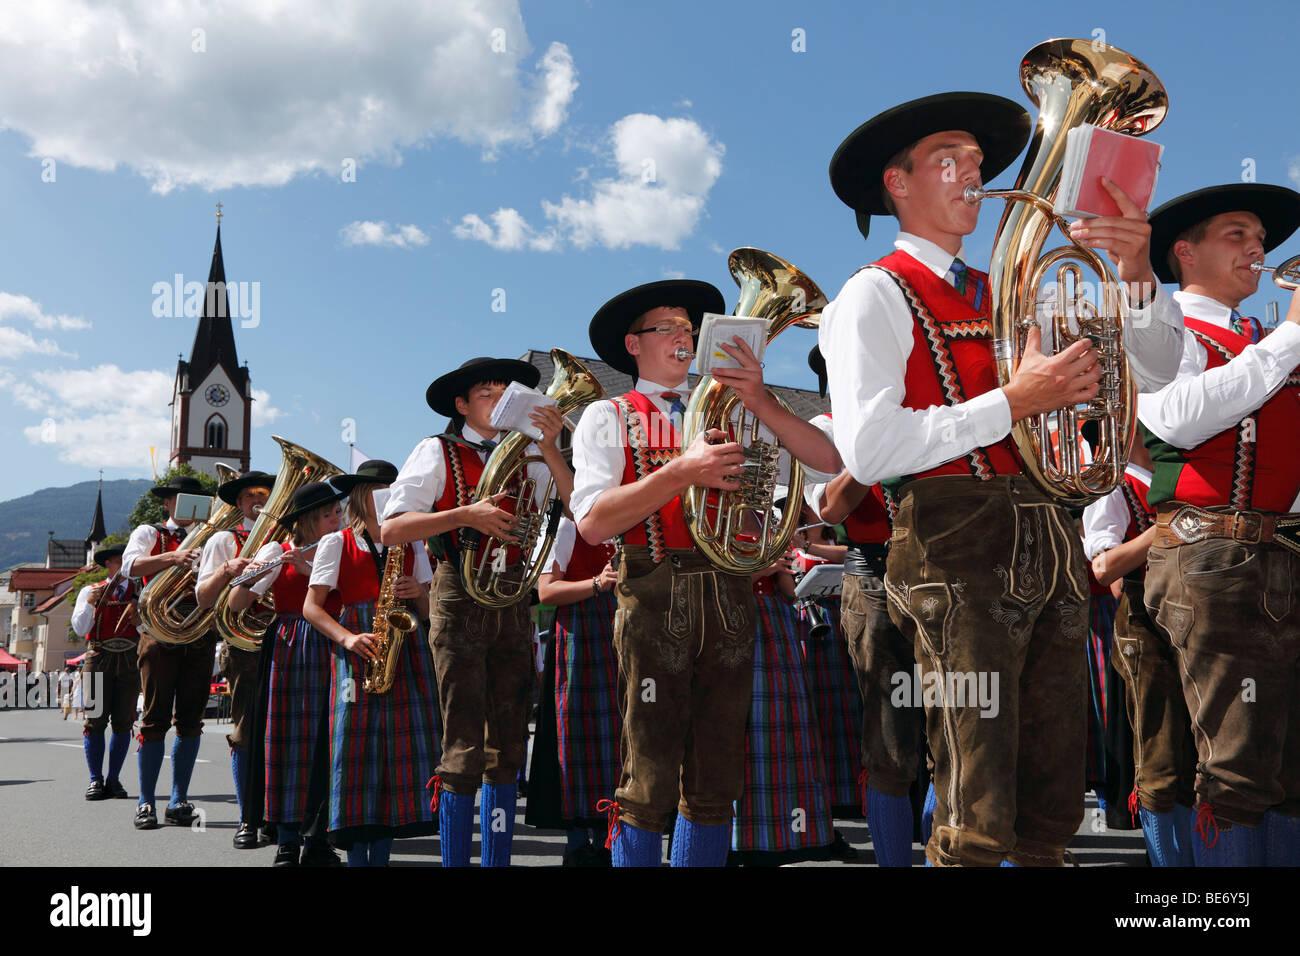 Folk music band at the Samson Parade, Mariapfarr, Lungau, Salzburg state, Salzburg, Austria, Europe - Stock Image